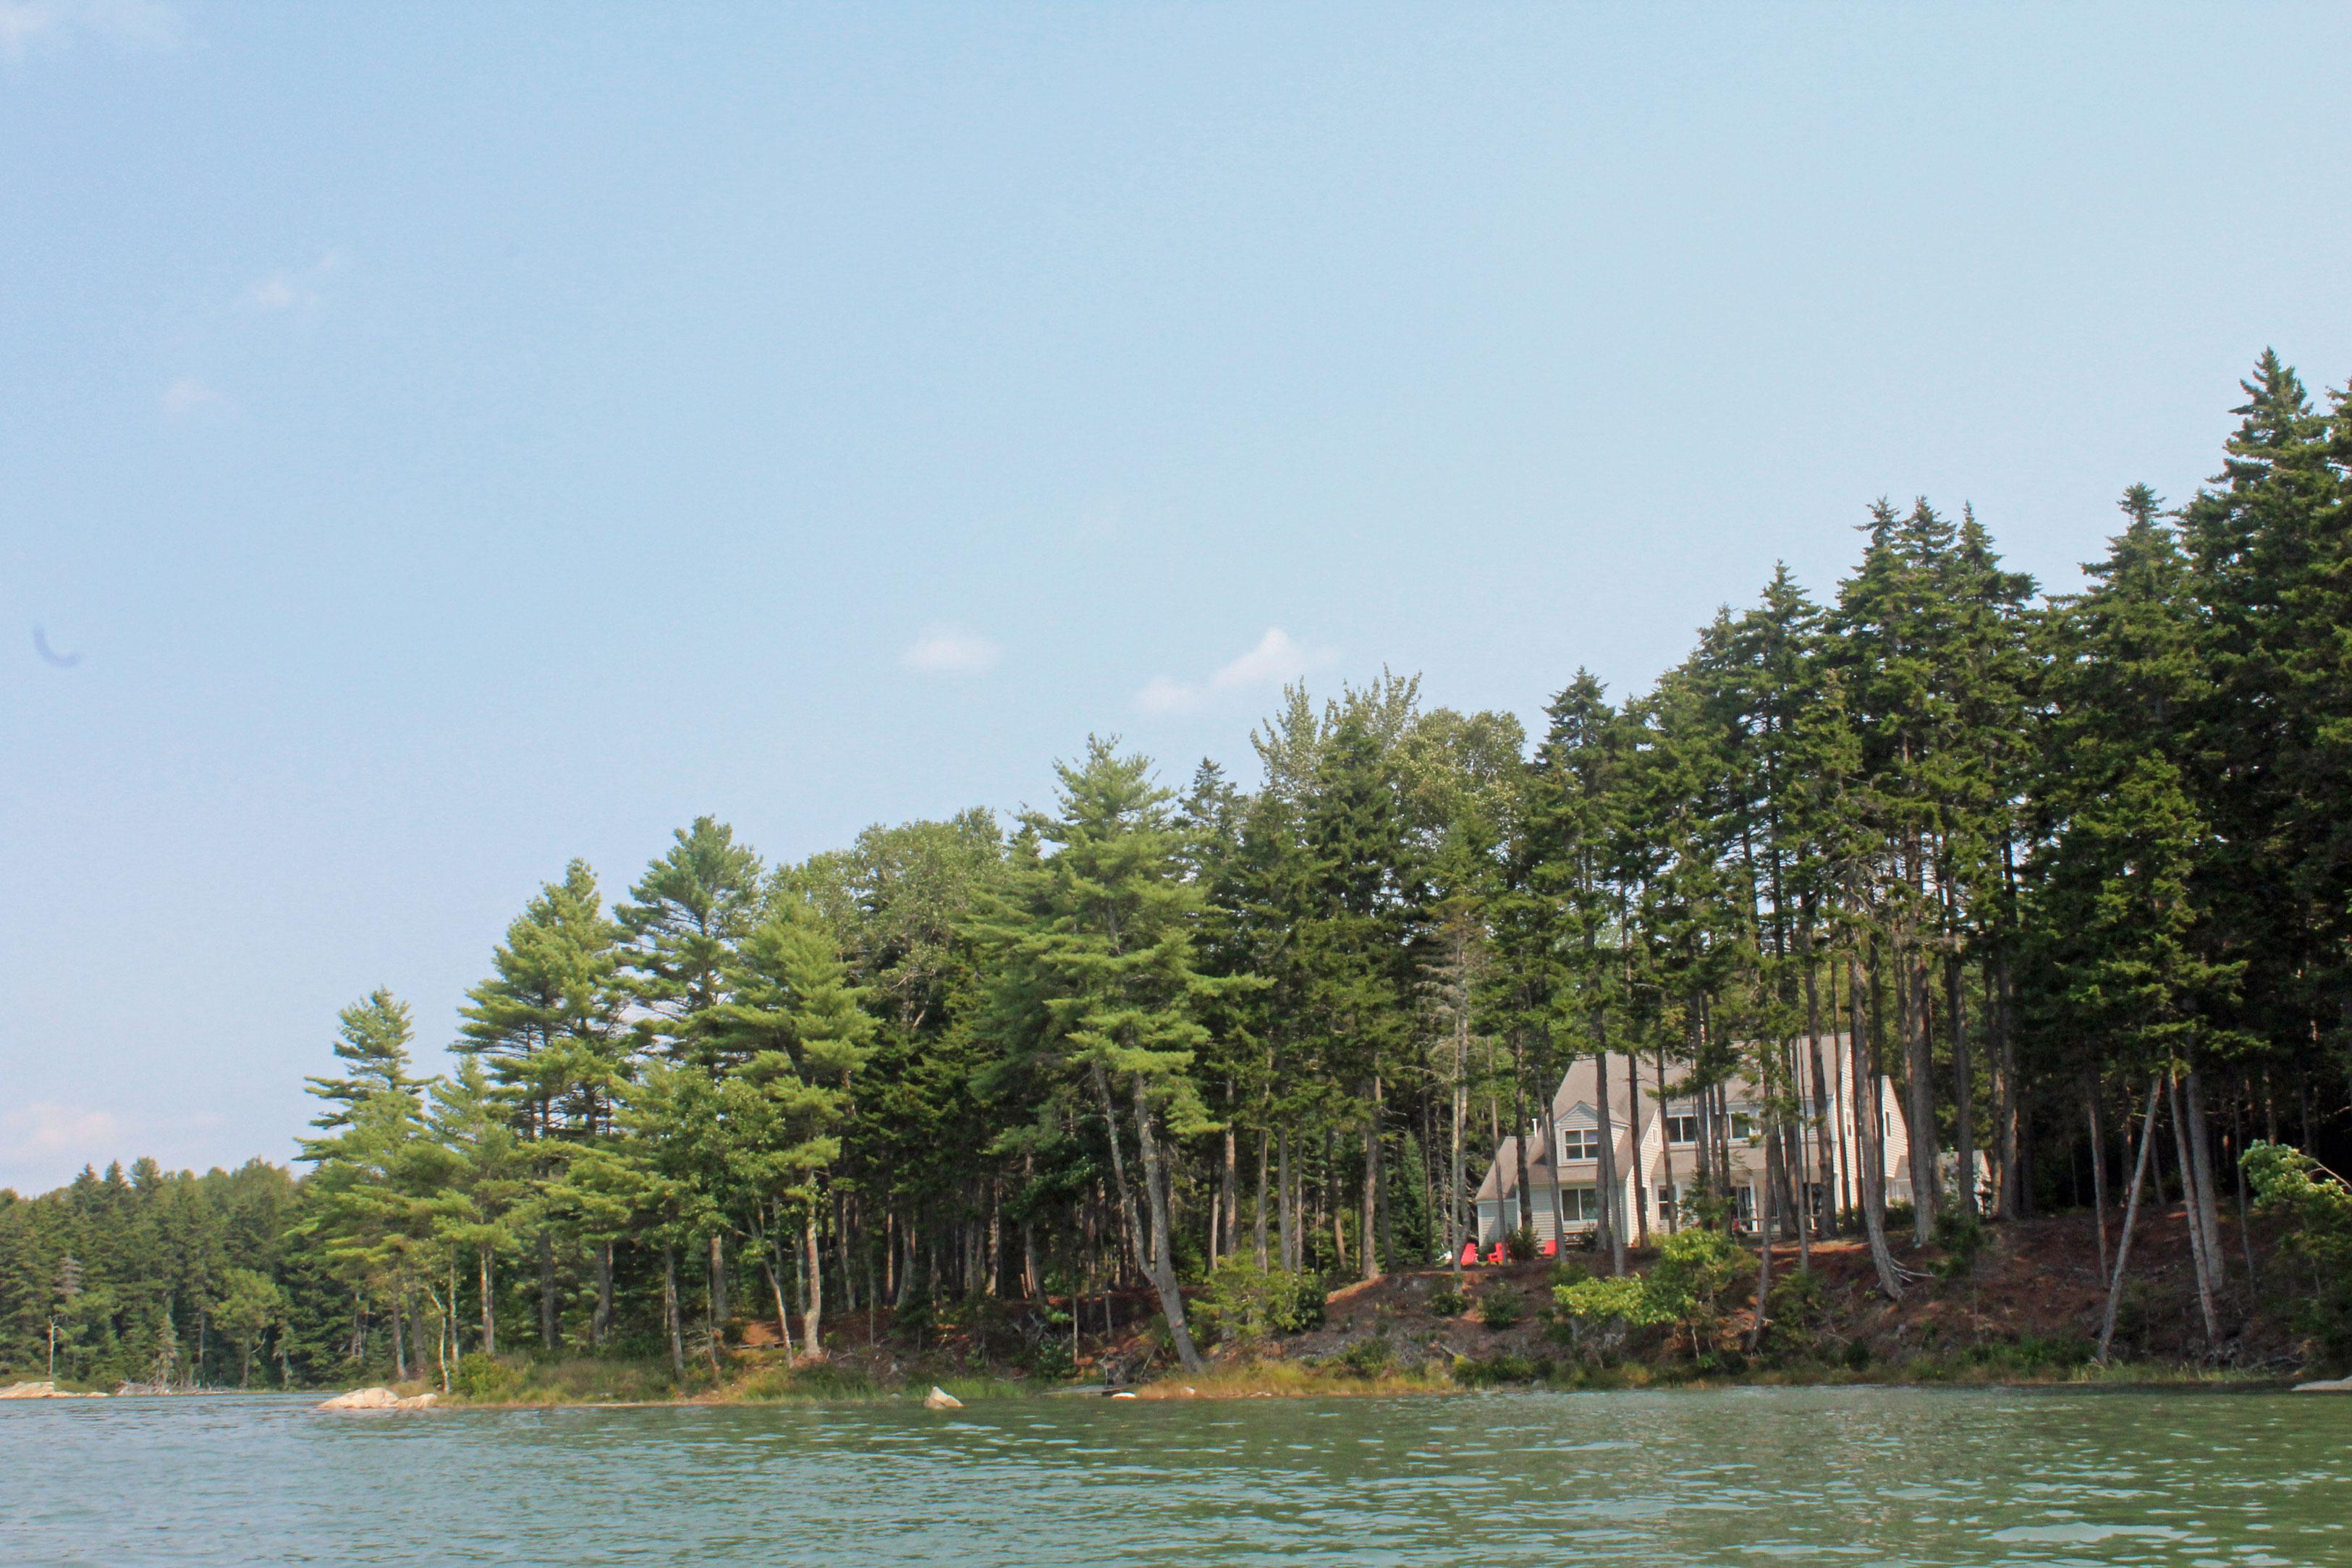 Single Family Home for Sale at 100 Thomas Lane, Waldoboro Waldoboro, Maine 04572 United States